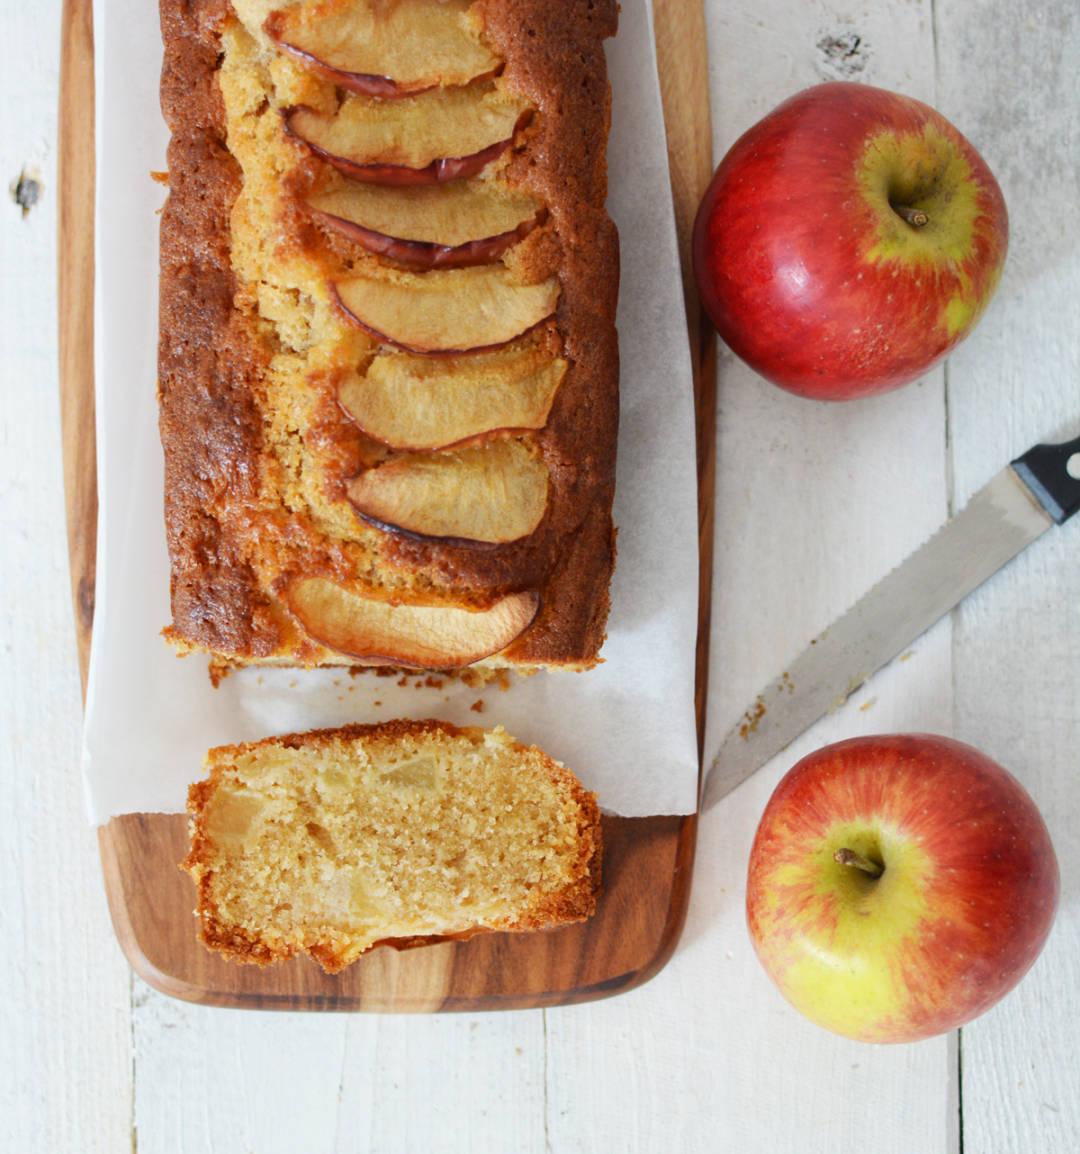 10. Appel kaneel cake